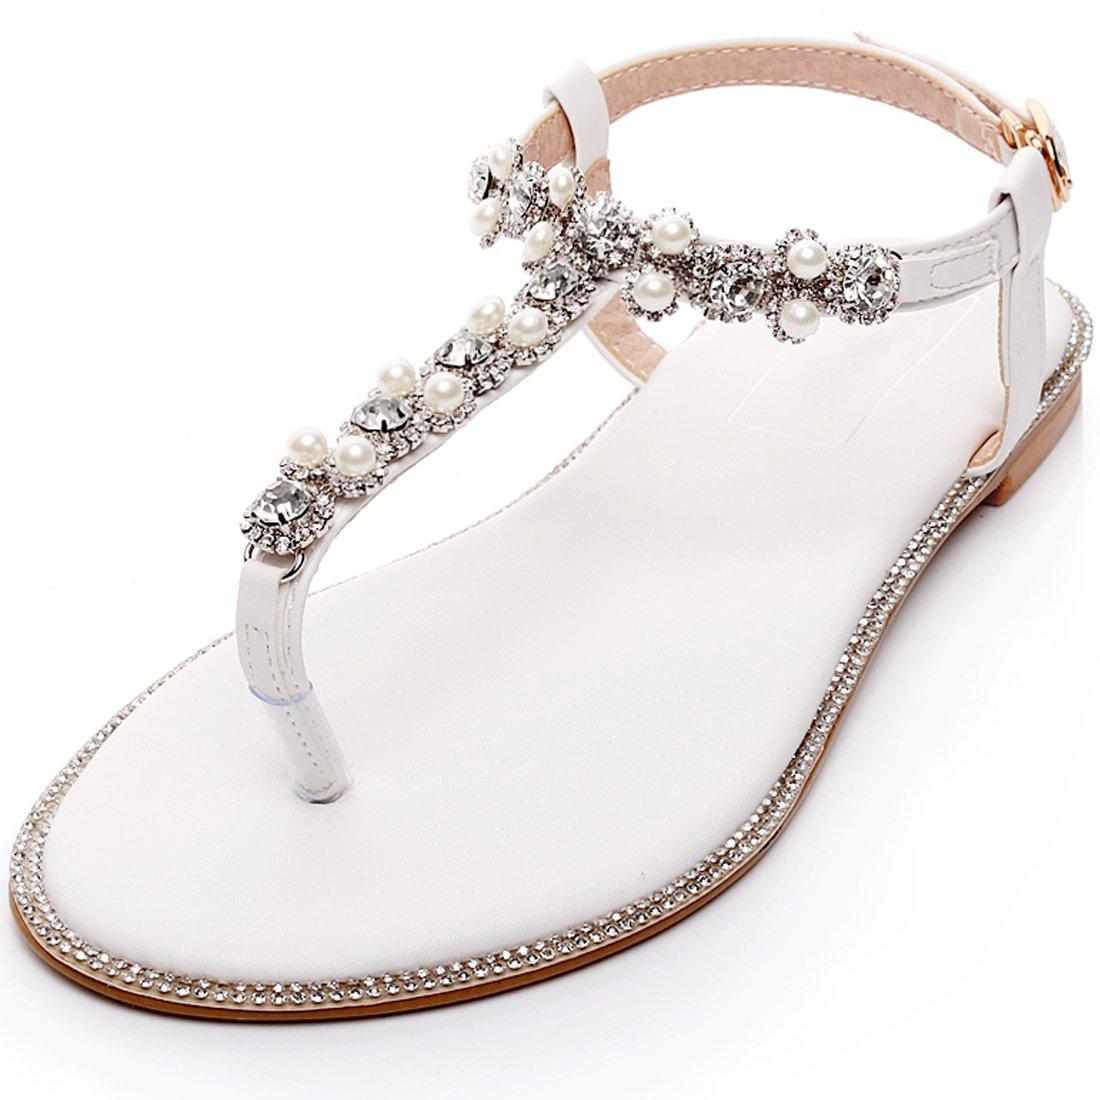 ff44a688fc241 YOOZIRI Beach Wedding Shoes,Wedding Flats Women Shoes,Flat Sandals With  Rhrintestone Pearls and crystals-BE-01